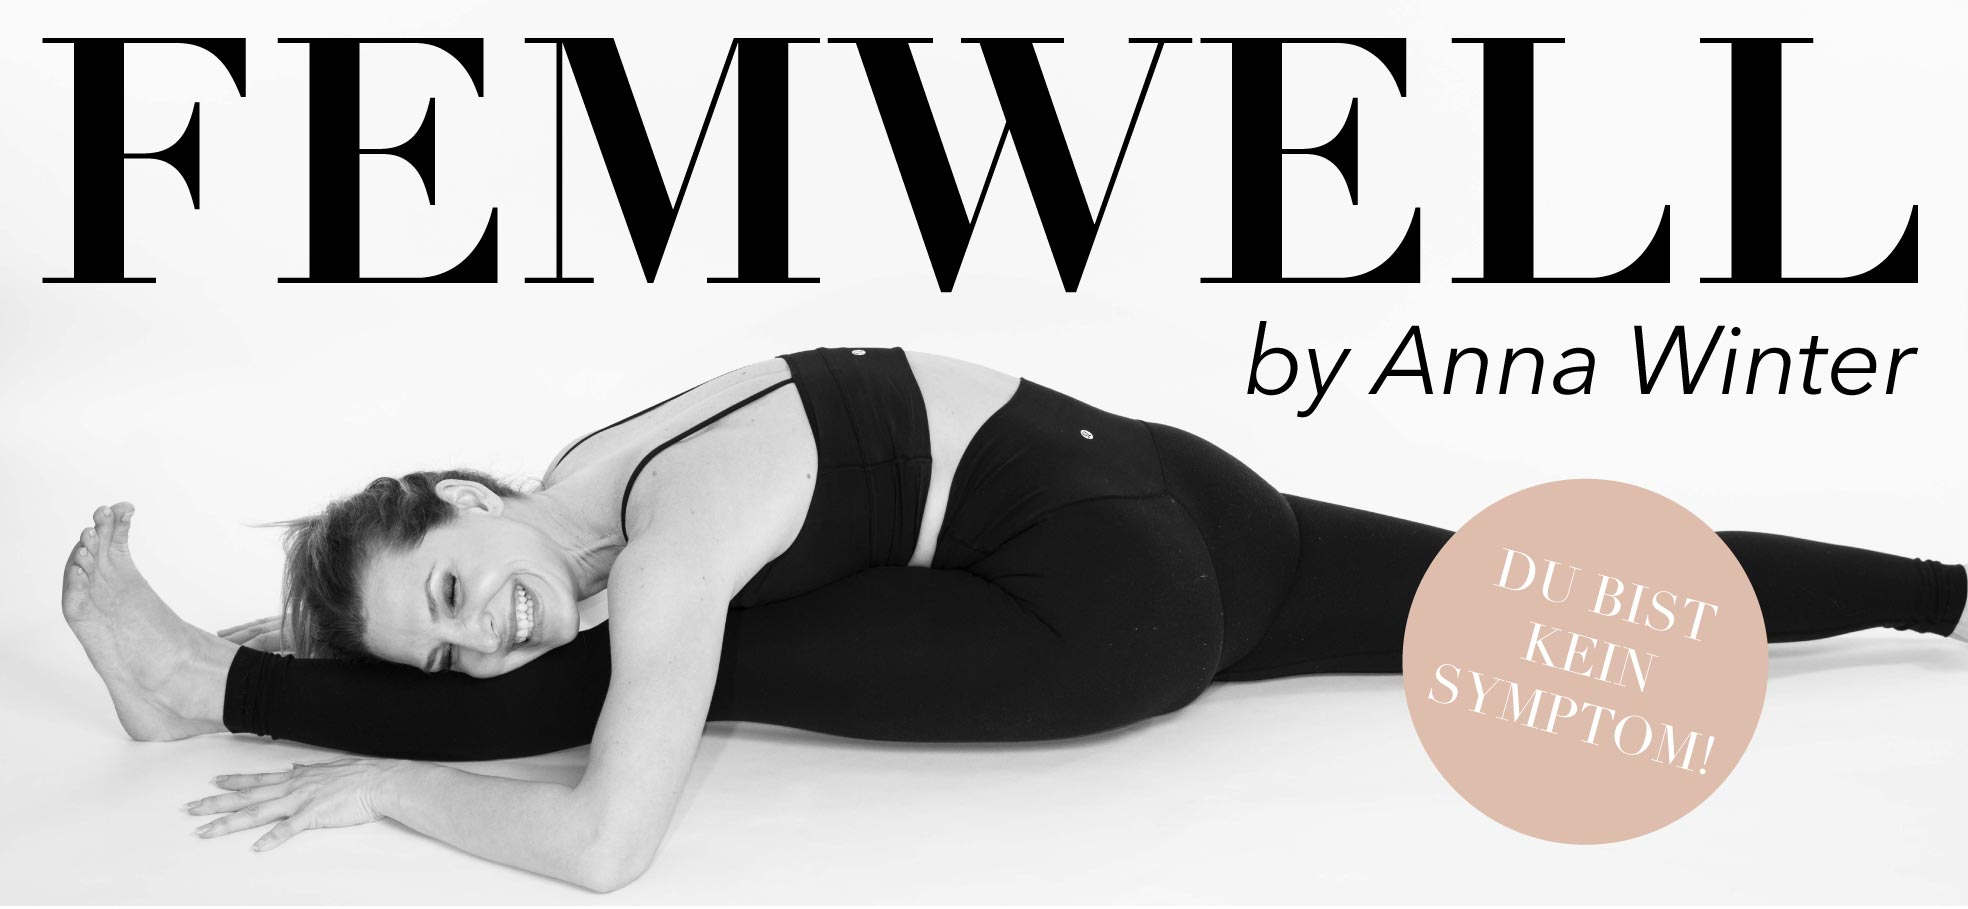 Femwell by Anna Winter-hero